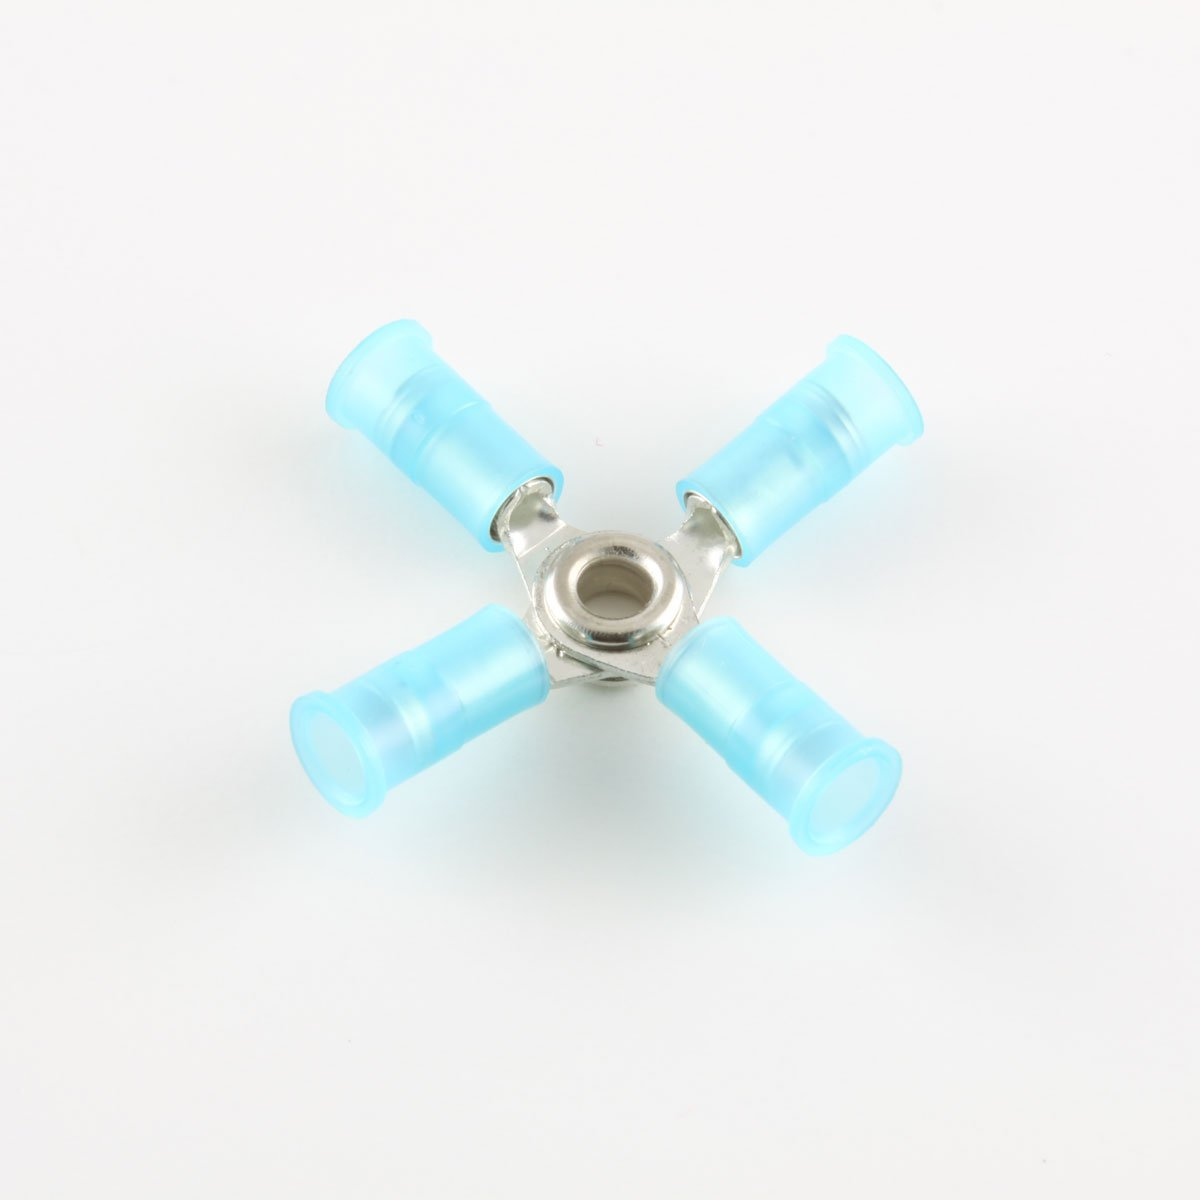 16-14 Ga. Nylon-Insulated 4-Way Terminals - (pack of 10)